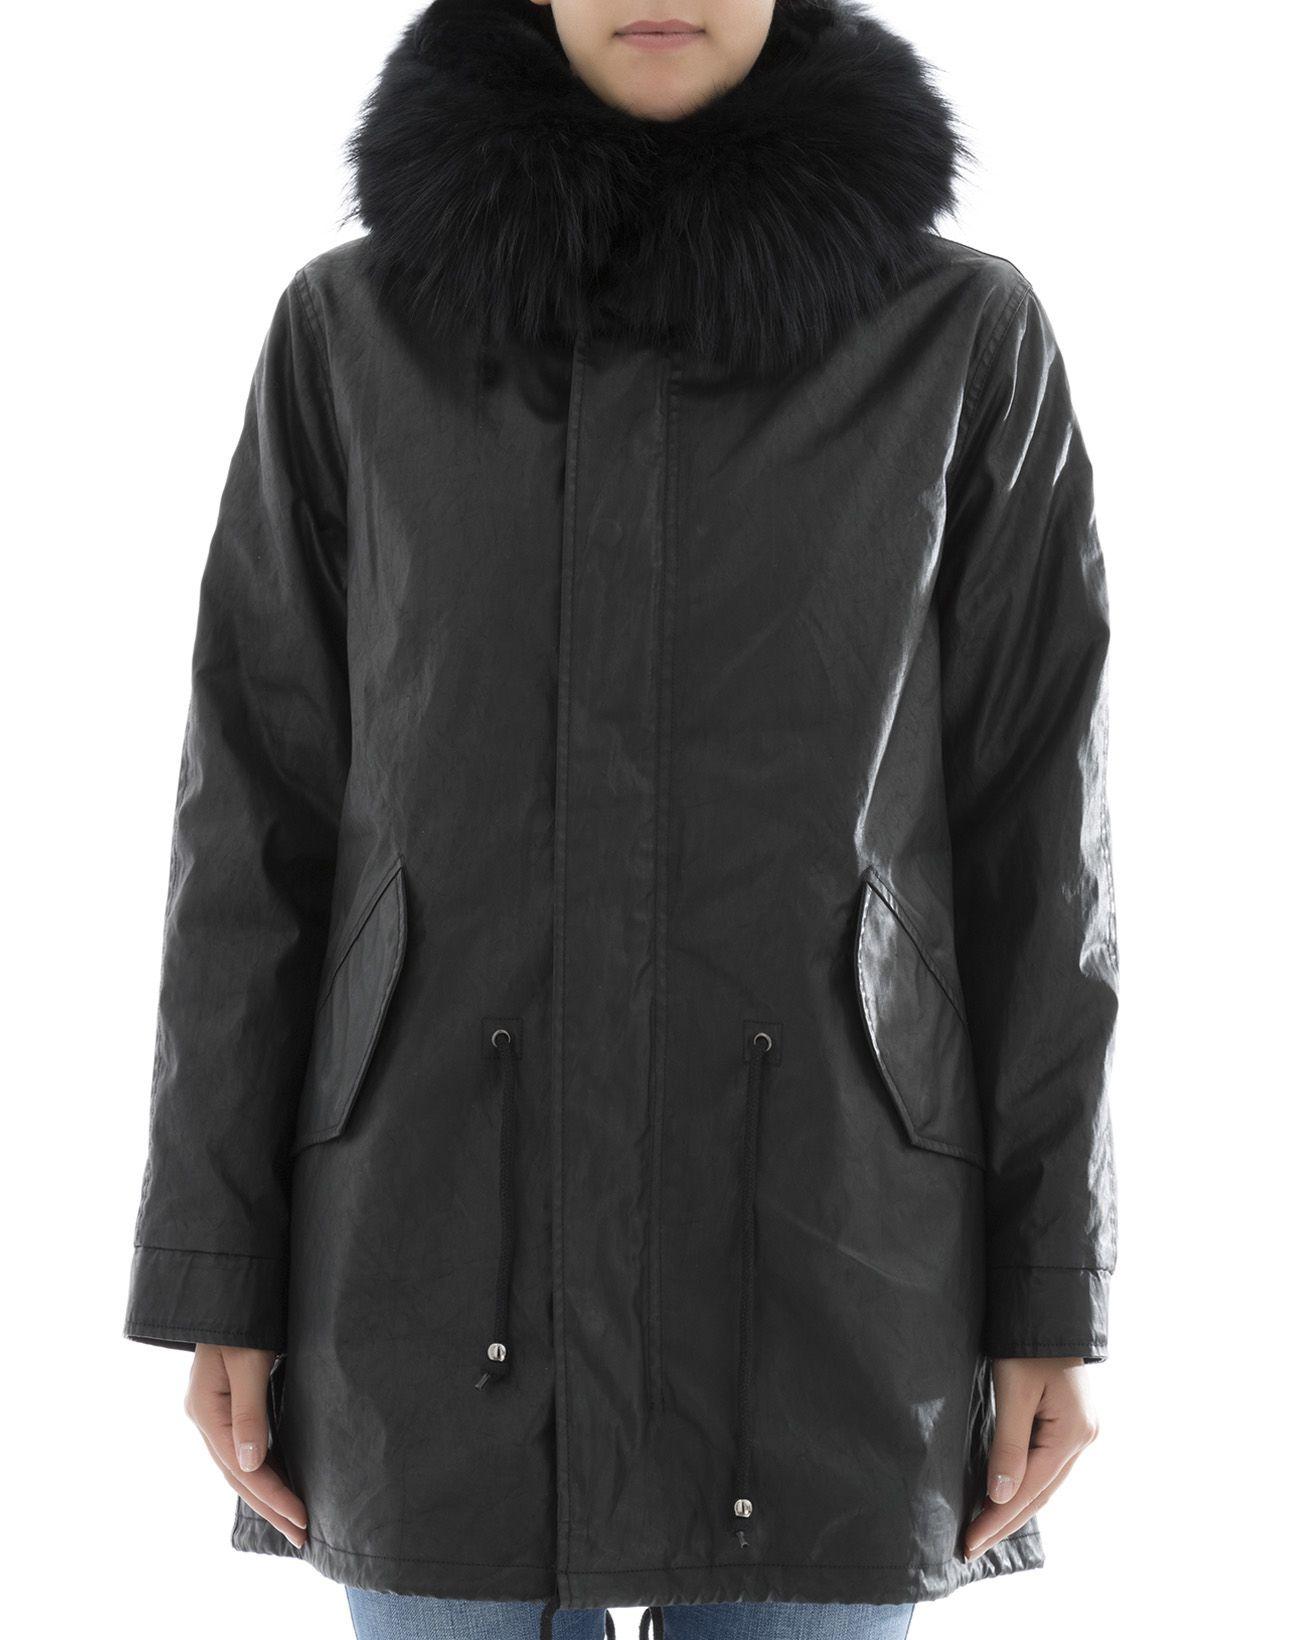 S.W.O.R.D. - Black Leather Parka - Black, Women's Coats & Jackets ...